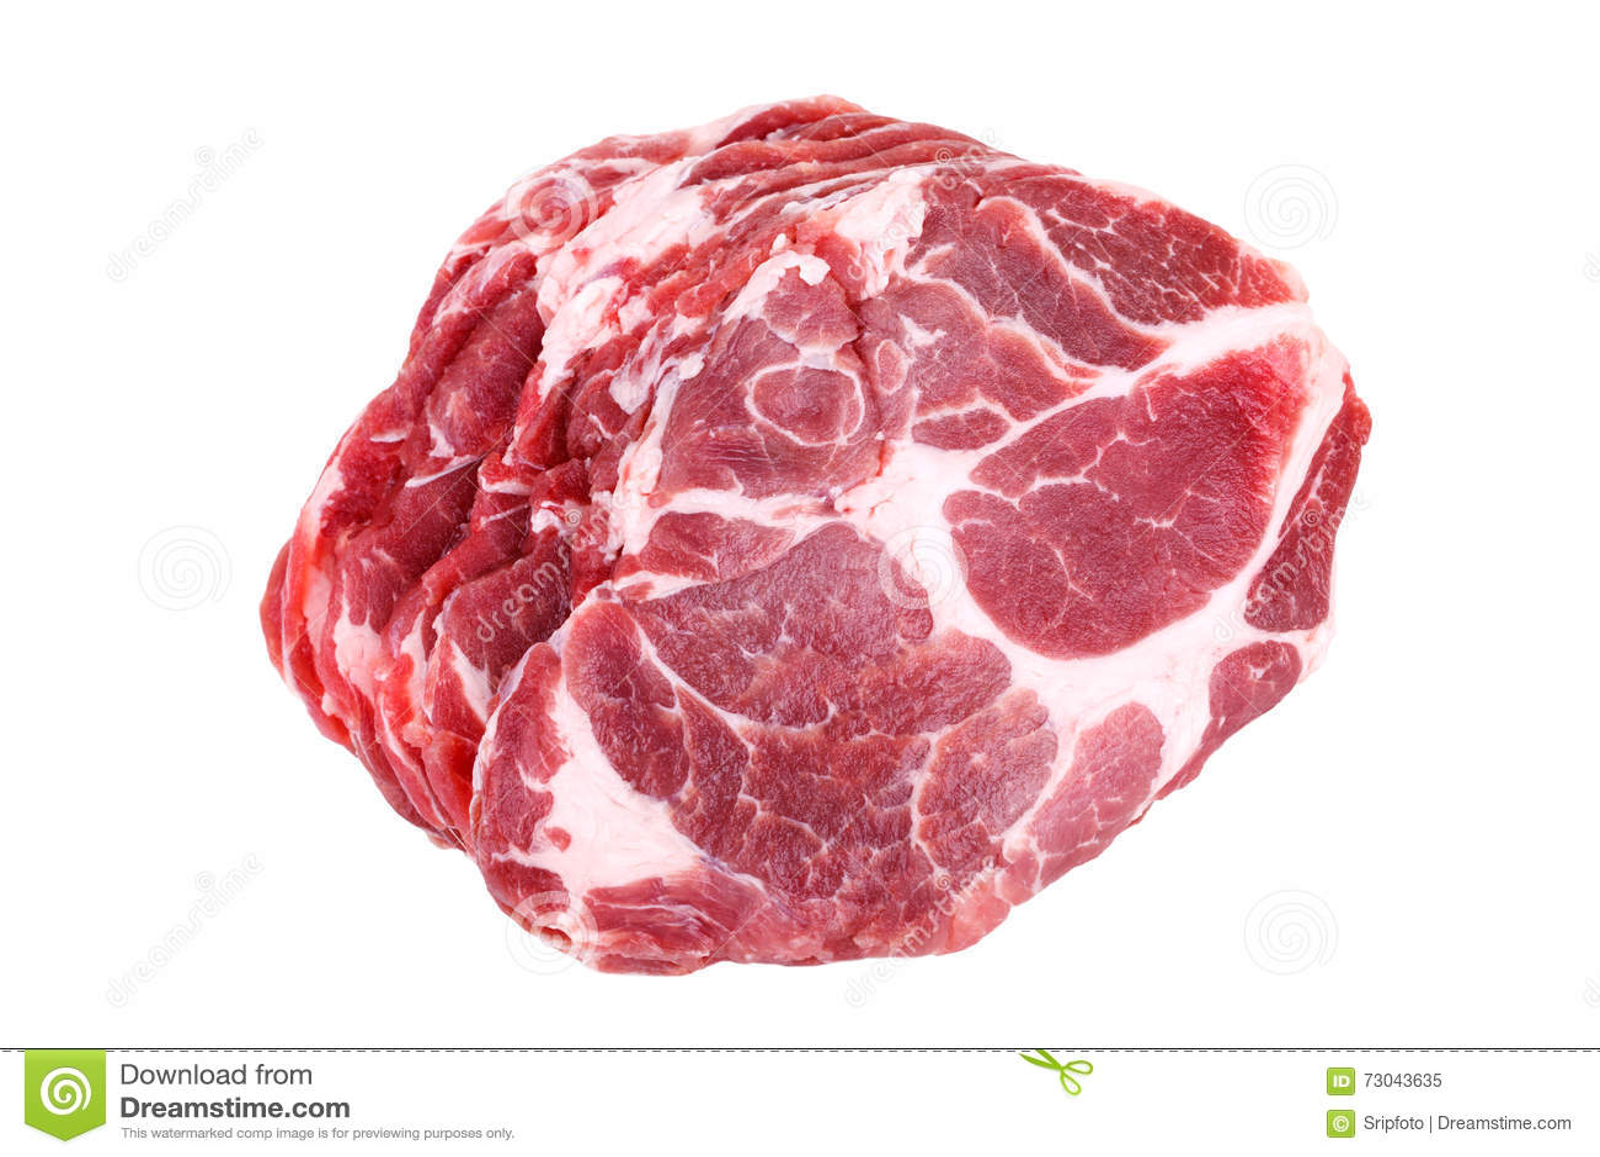 Fresh crude pork neck meat steak isolated on white background